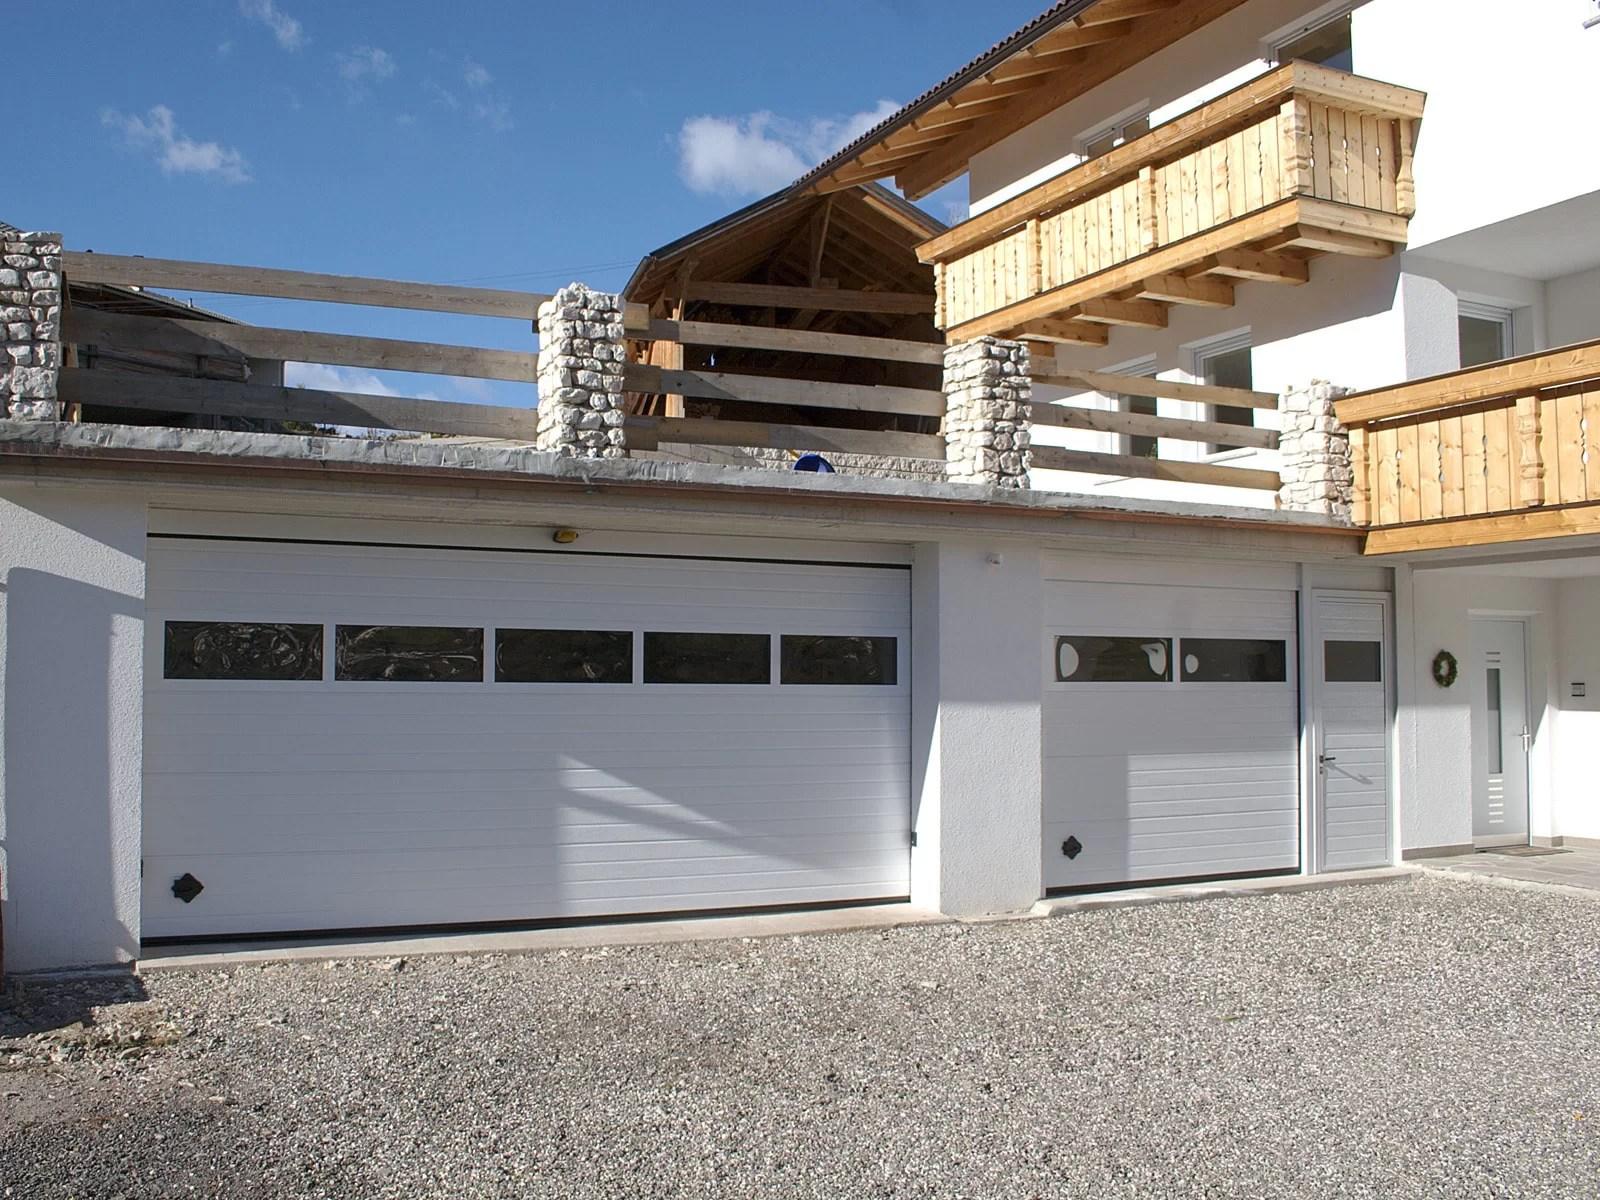 Portone sezionale da garage SIRIO - Woodgrain bianco C81 Visa